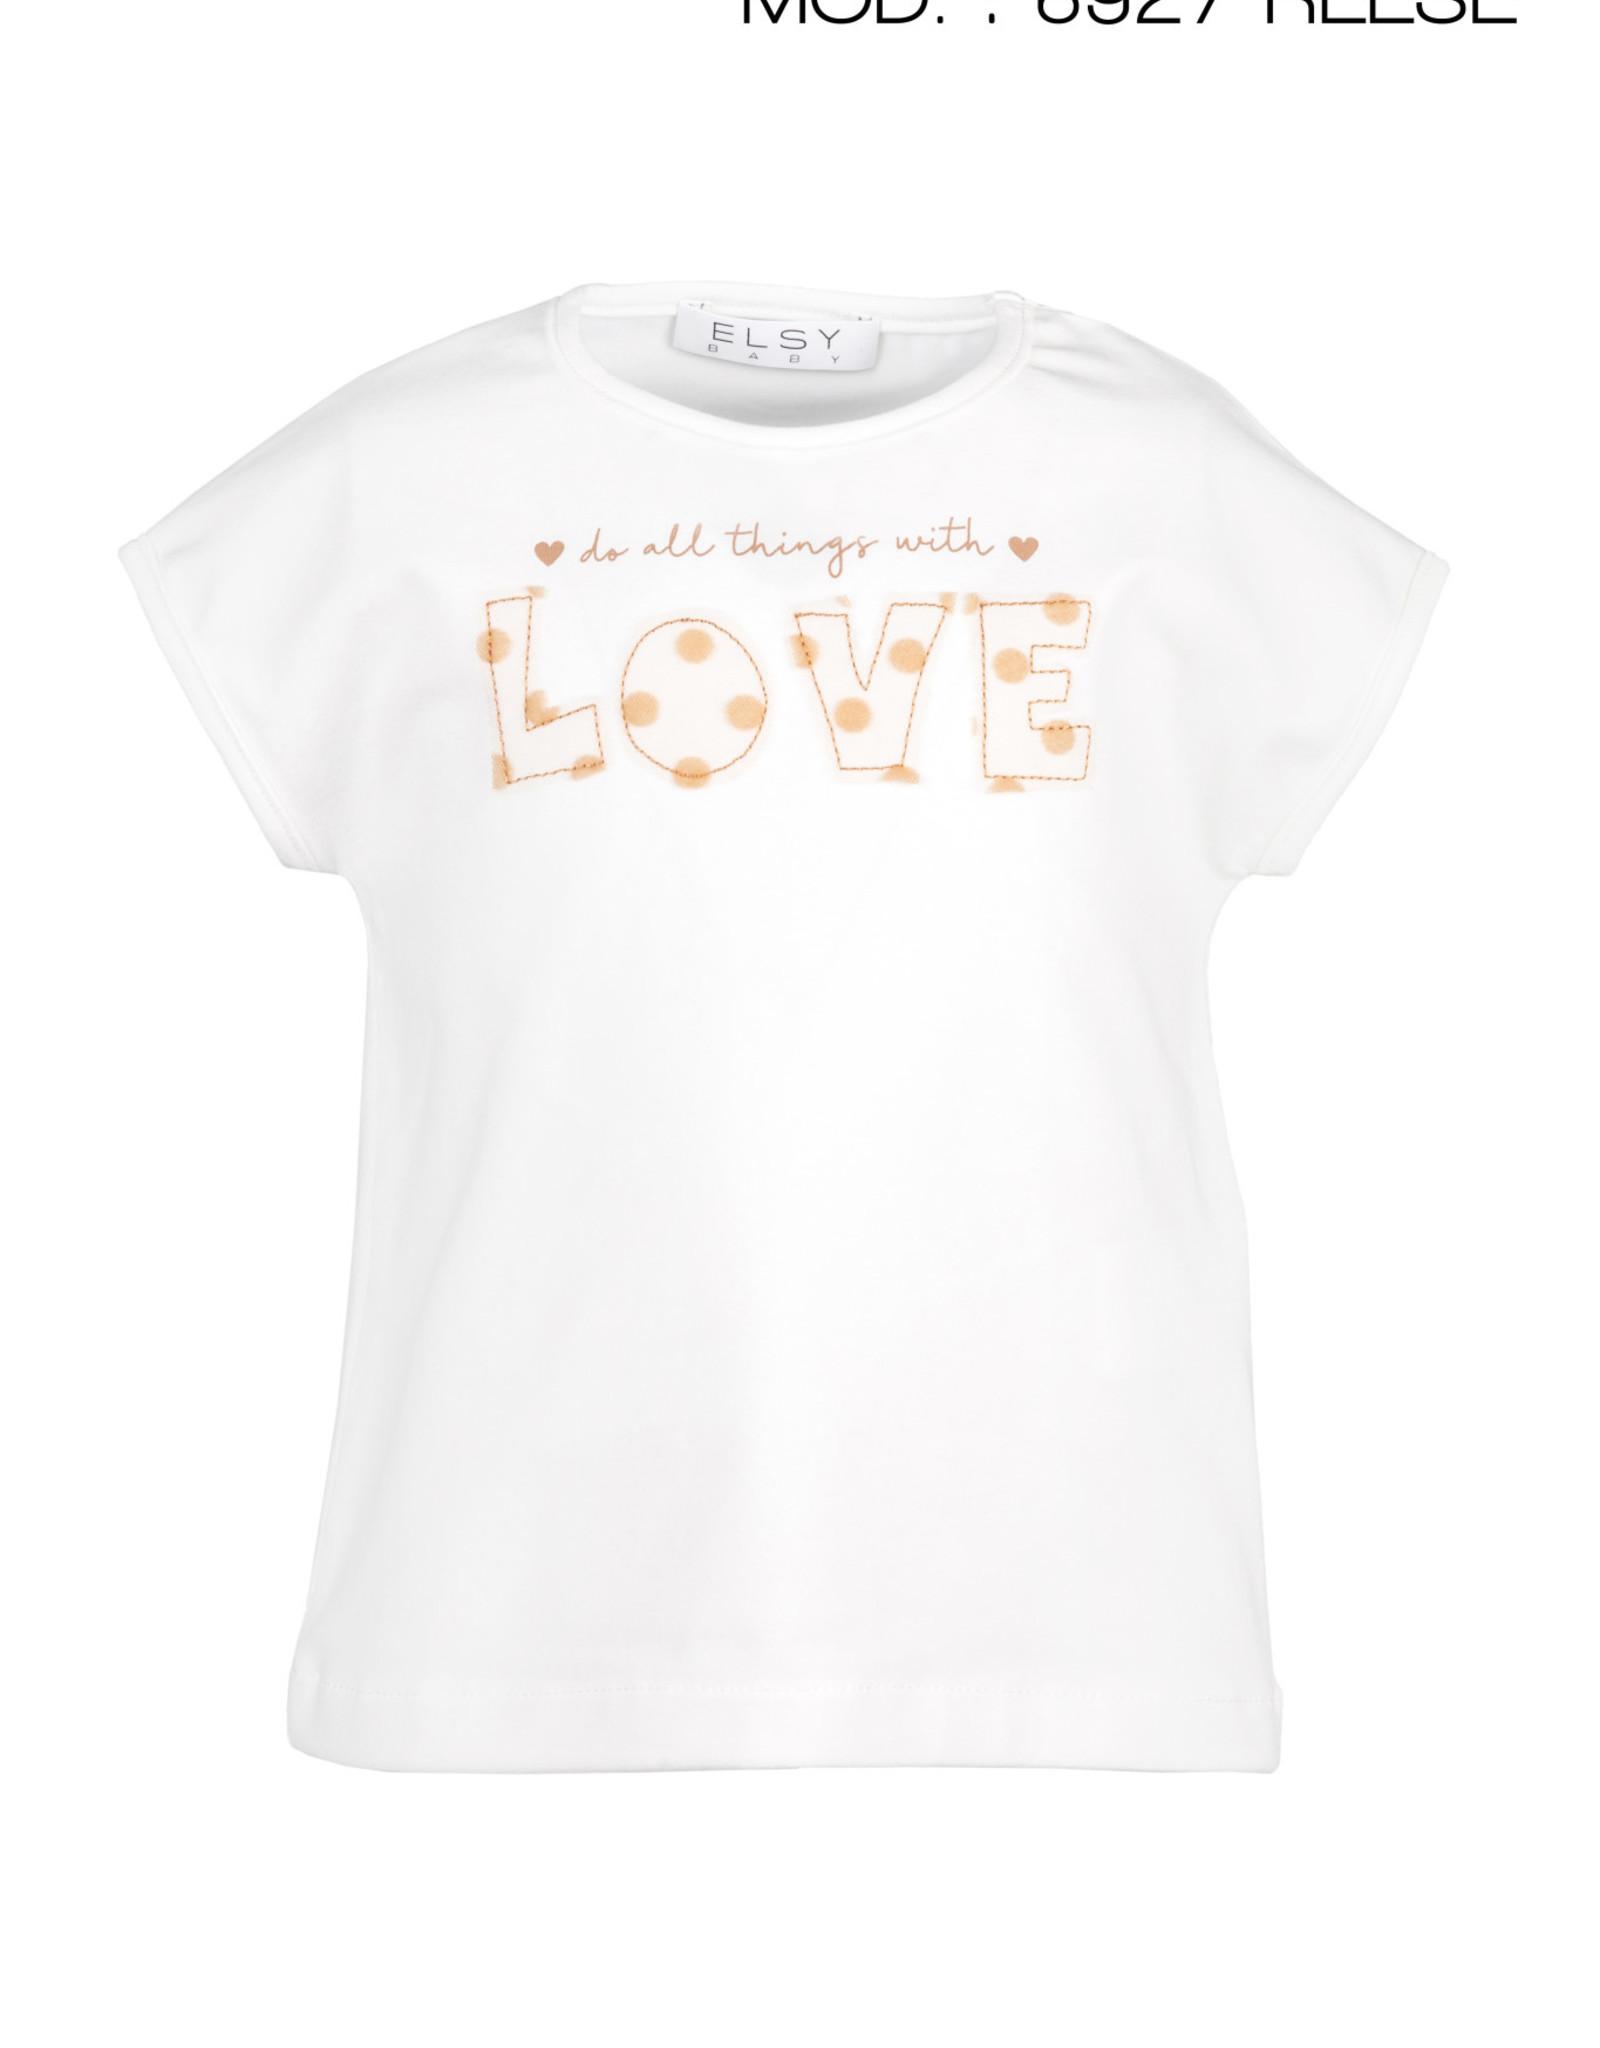 ELSY ELSY Reese t-shirt